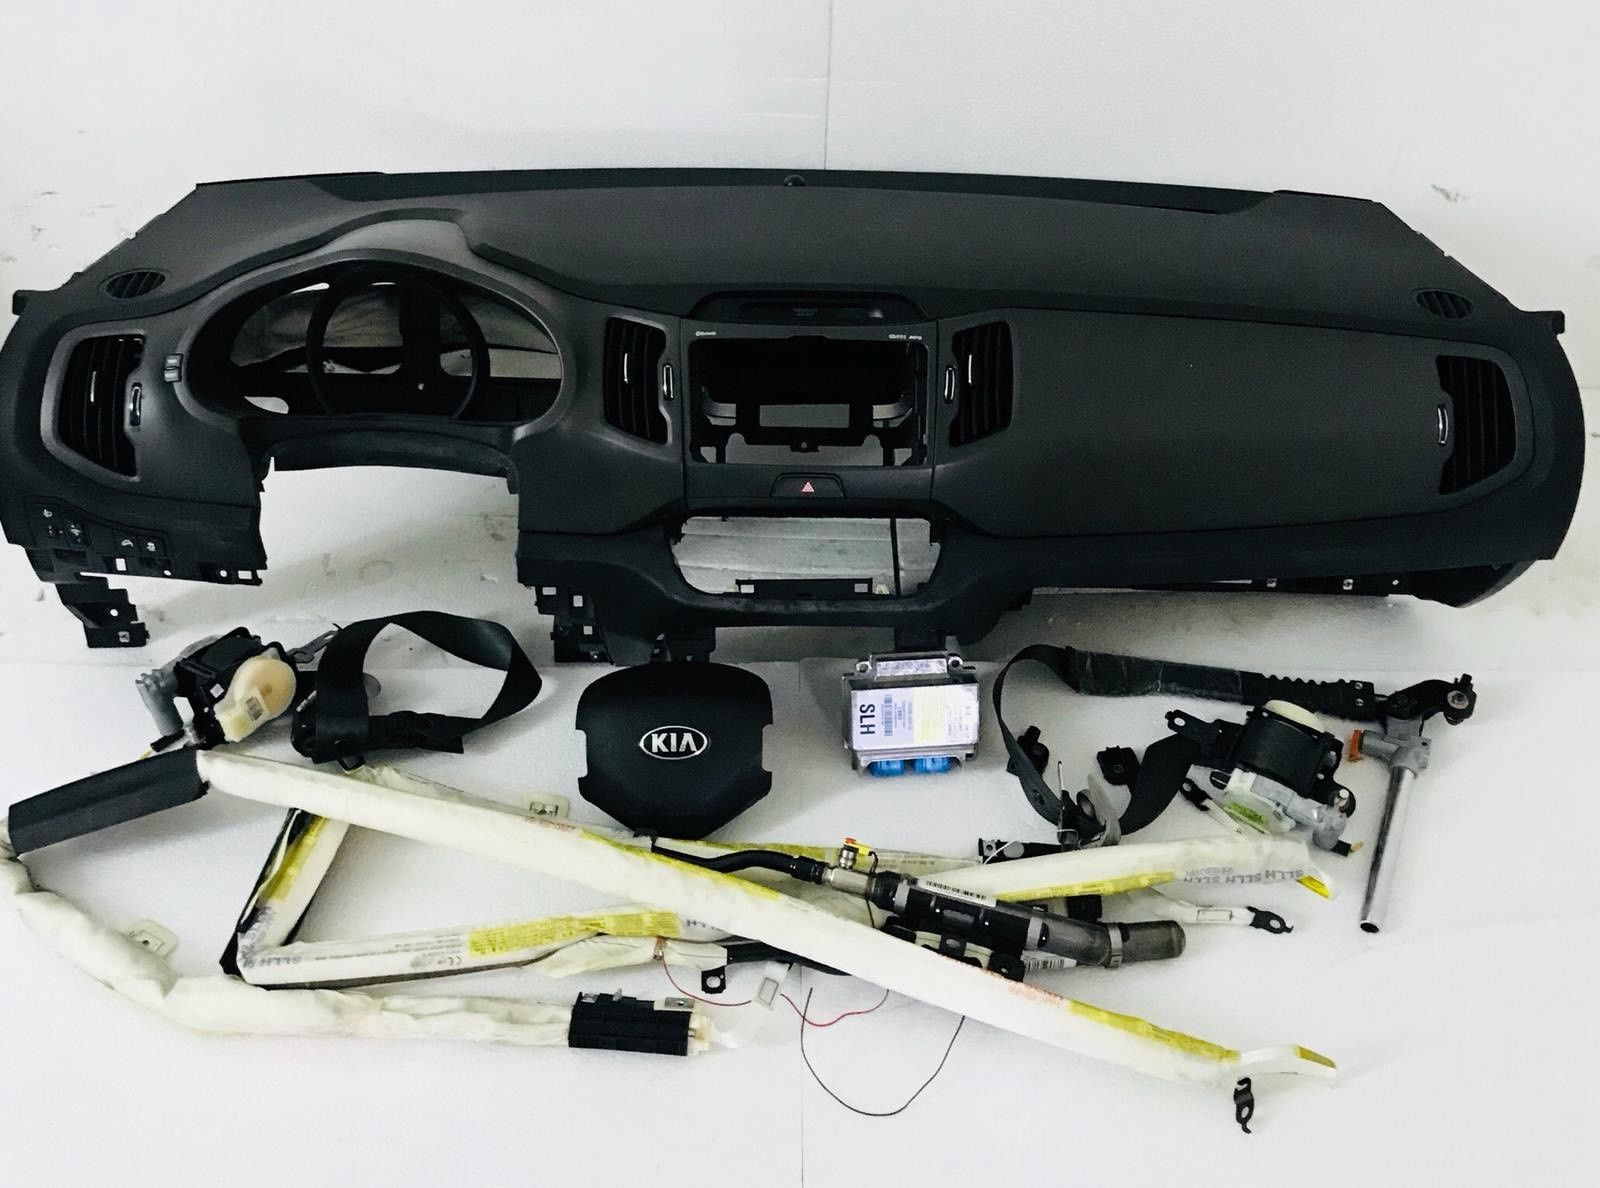 Kit Airbag Completo Kia Sportage Anno 2013 Originale